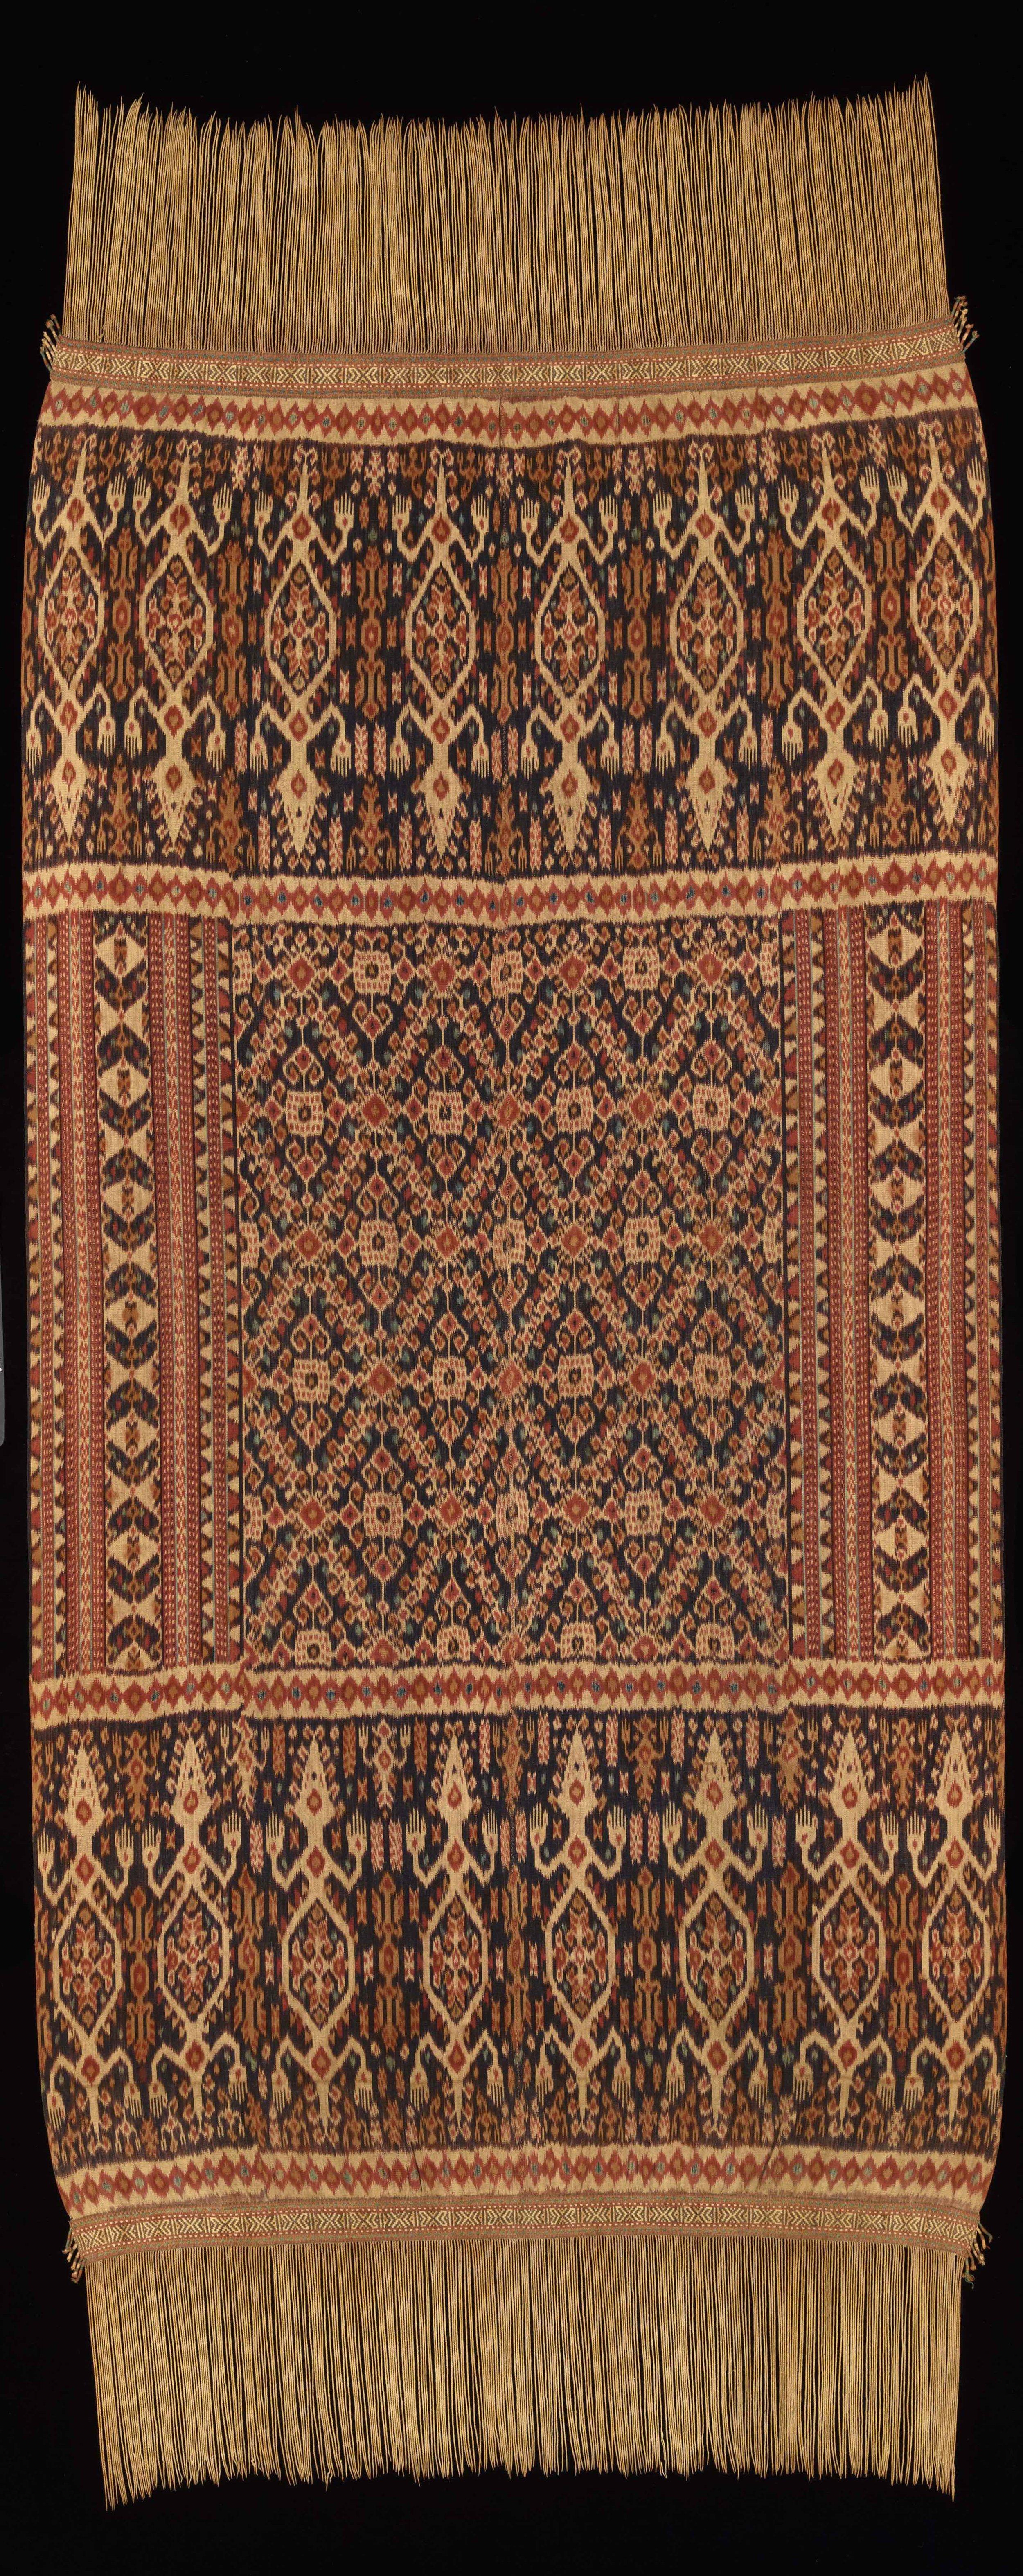 Man's Ceremonial Ikat Mantle | Hinggi © Dallas Museum of Art | Texas, USA